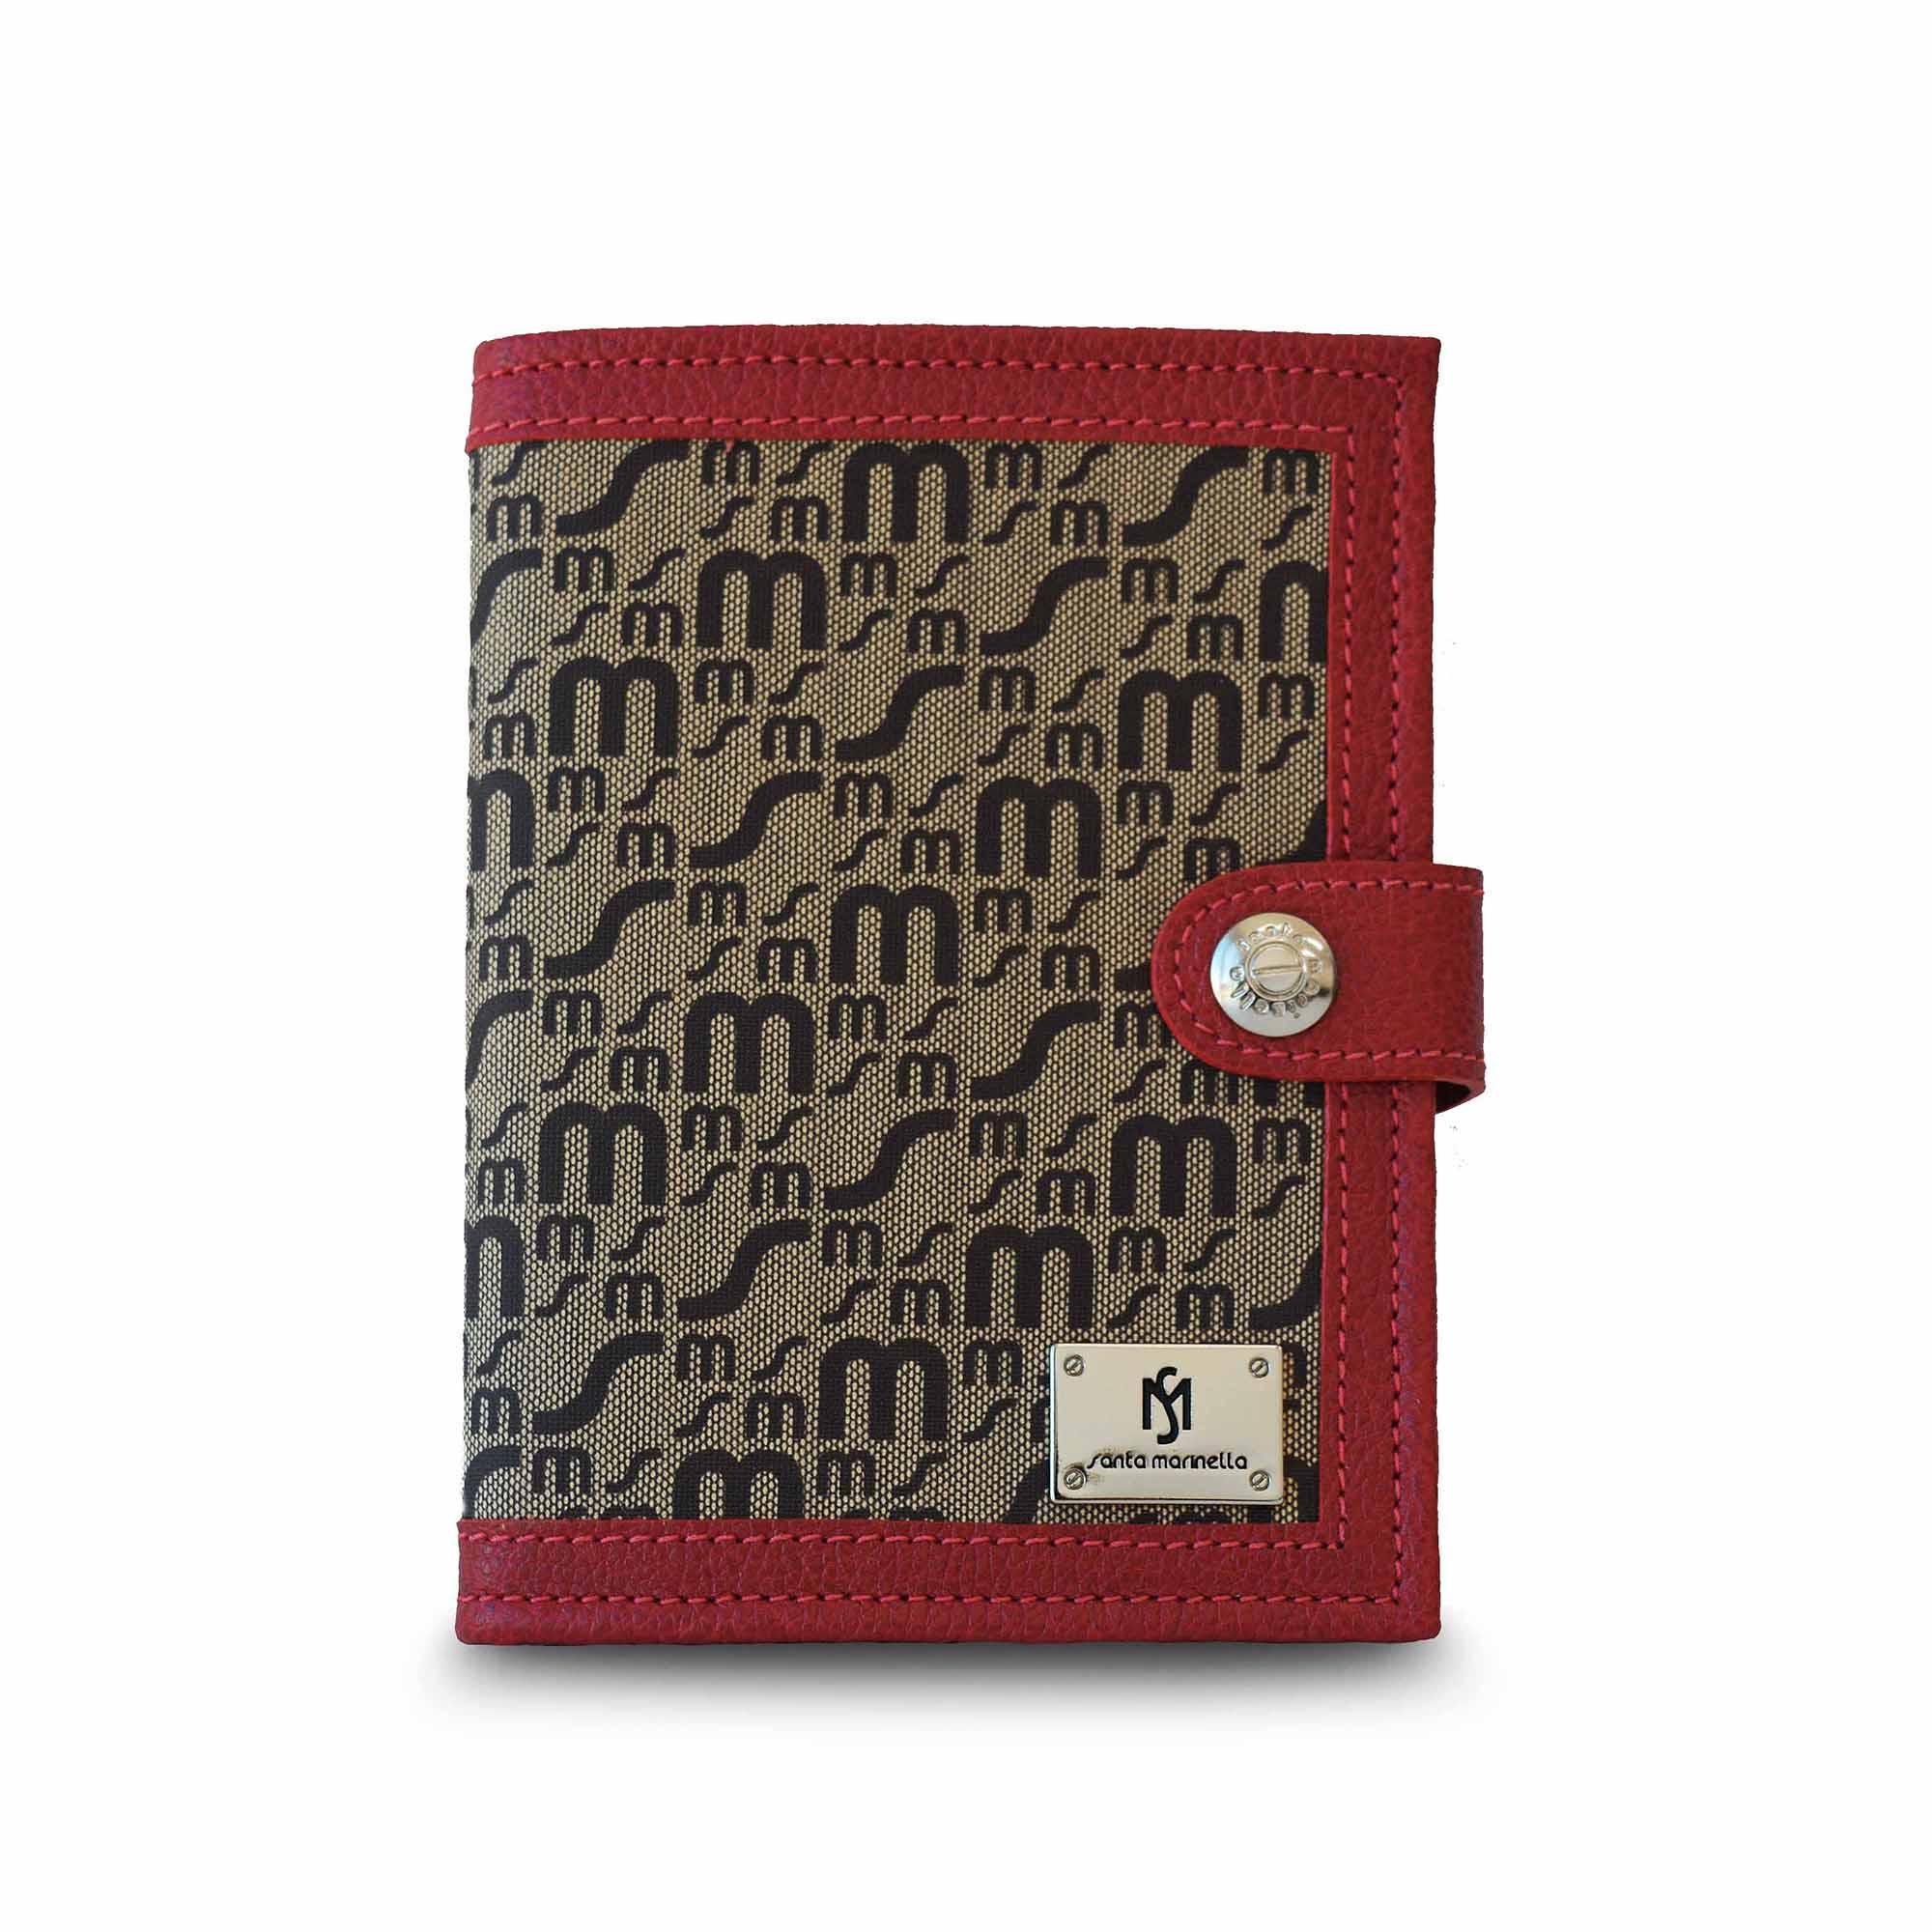 Carteira SM C196 -  Monograma Couro